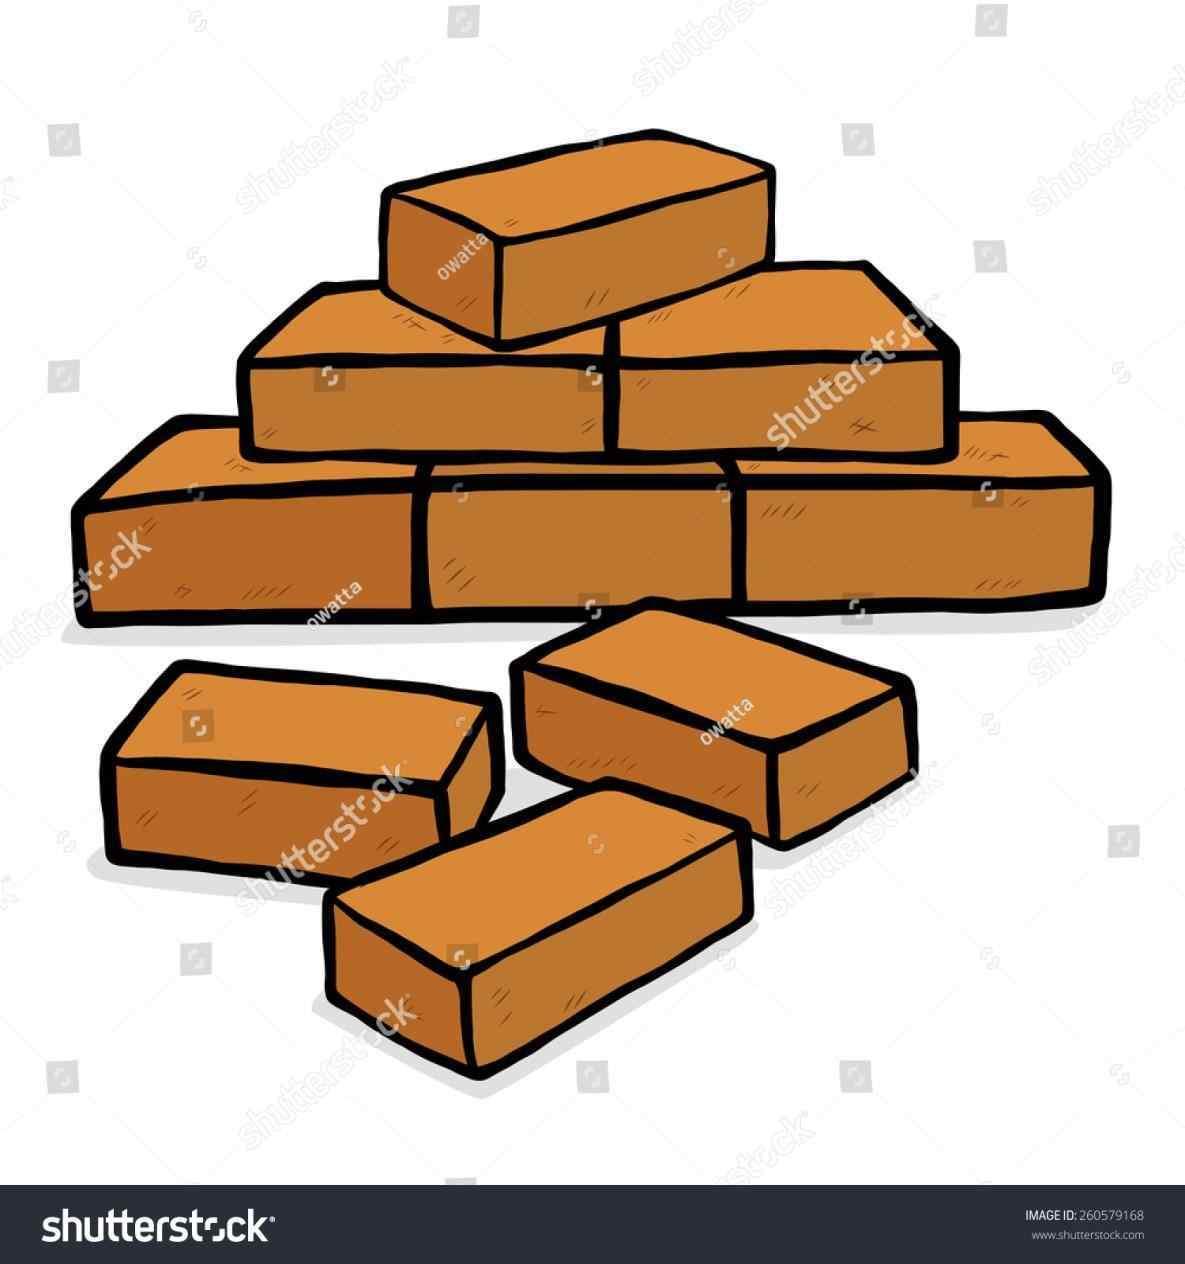 Brick clipart.  clipartlook